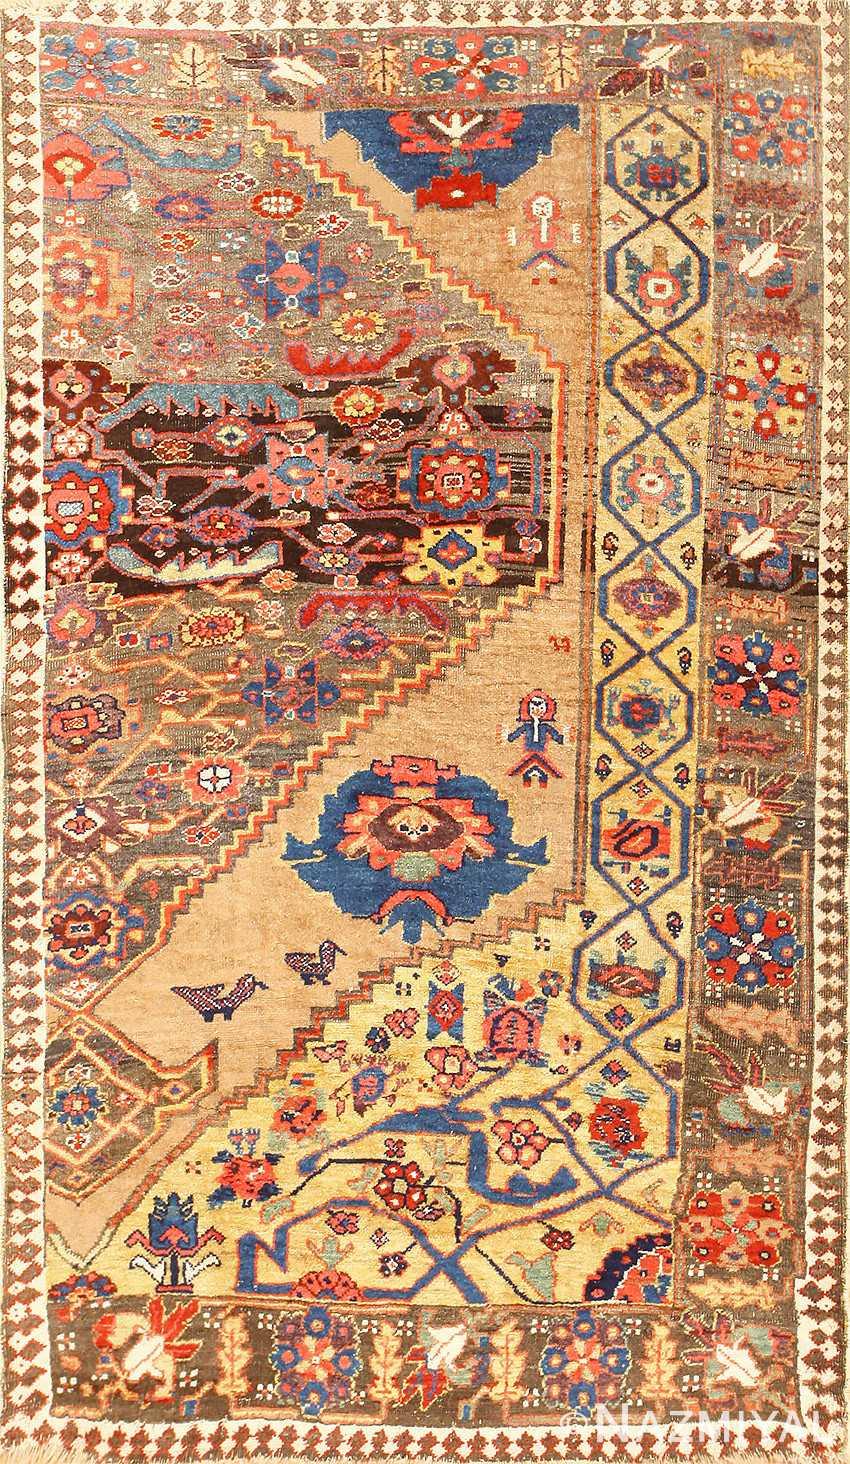 Rare Antique Tribal Persian Bidjar Sampler Rug 48628 Nazmiyal